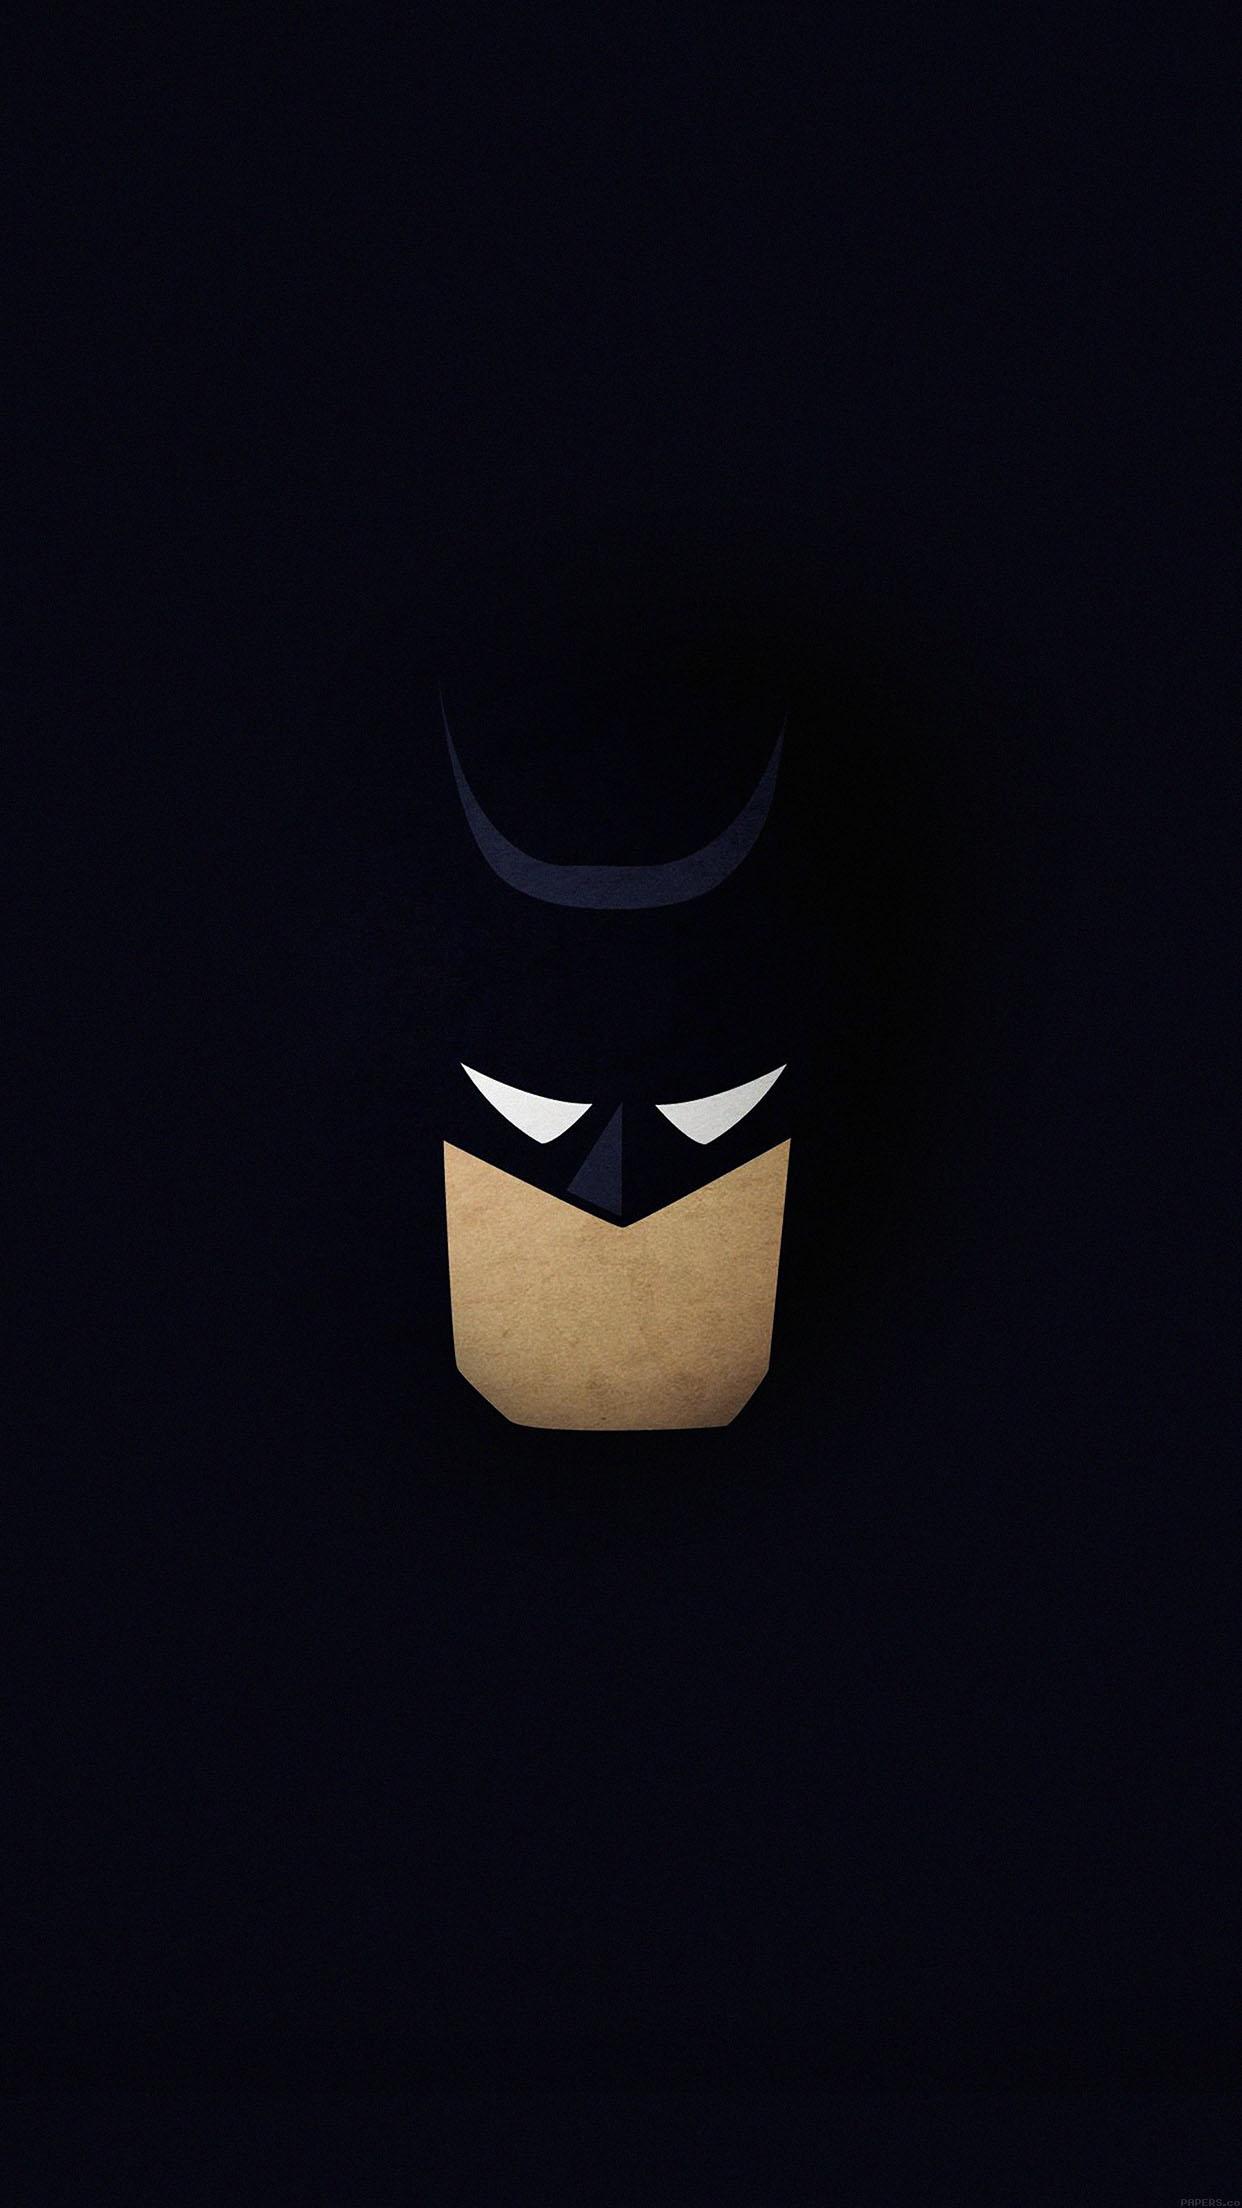 Ab54 Wallpaper Batman Face Dark Minimal